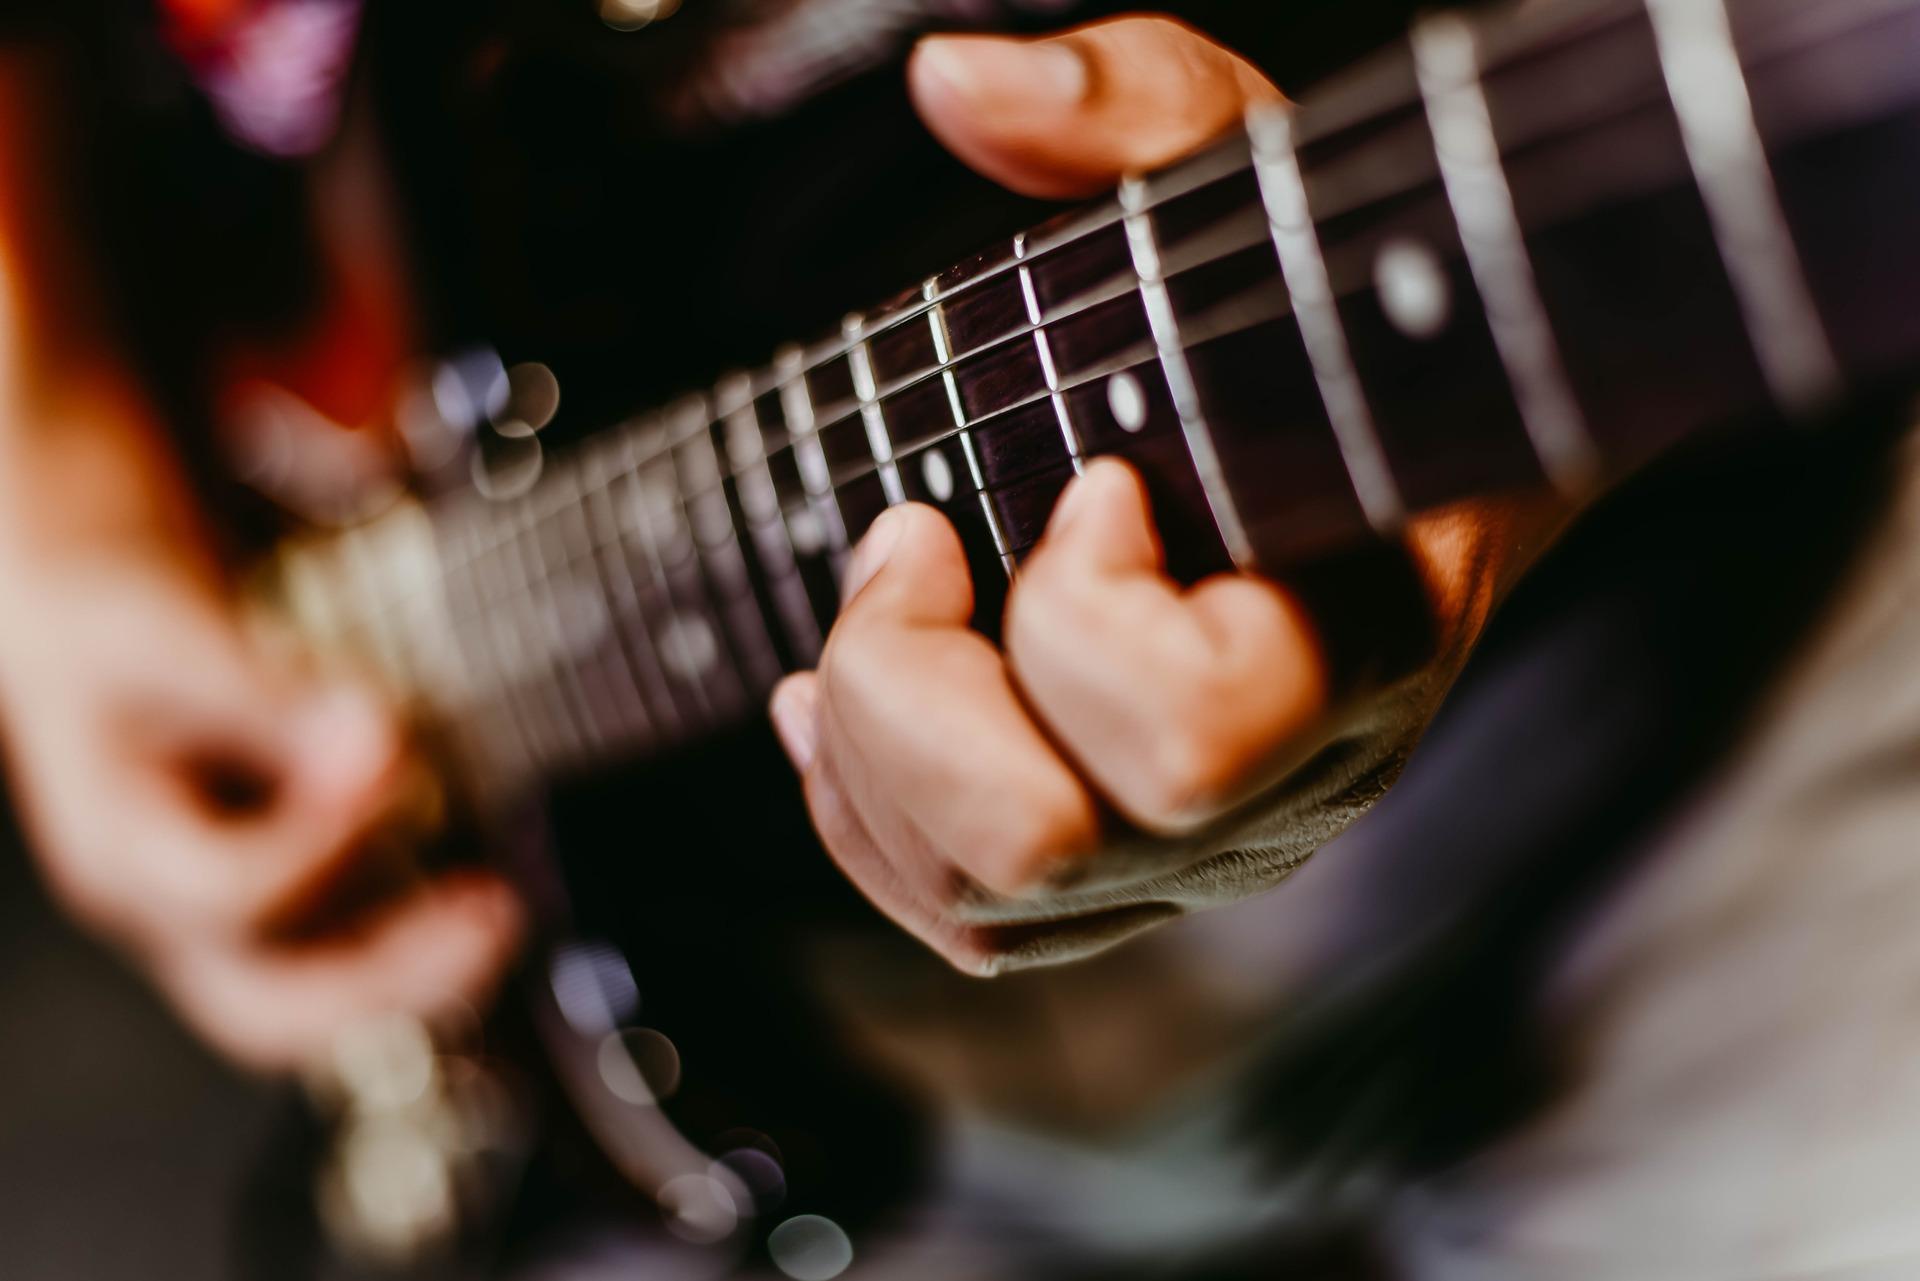 electric-guitar-2148807_1920